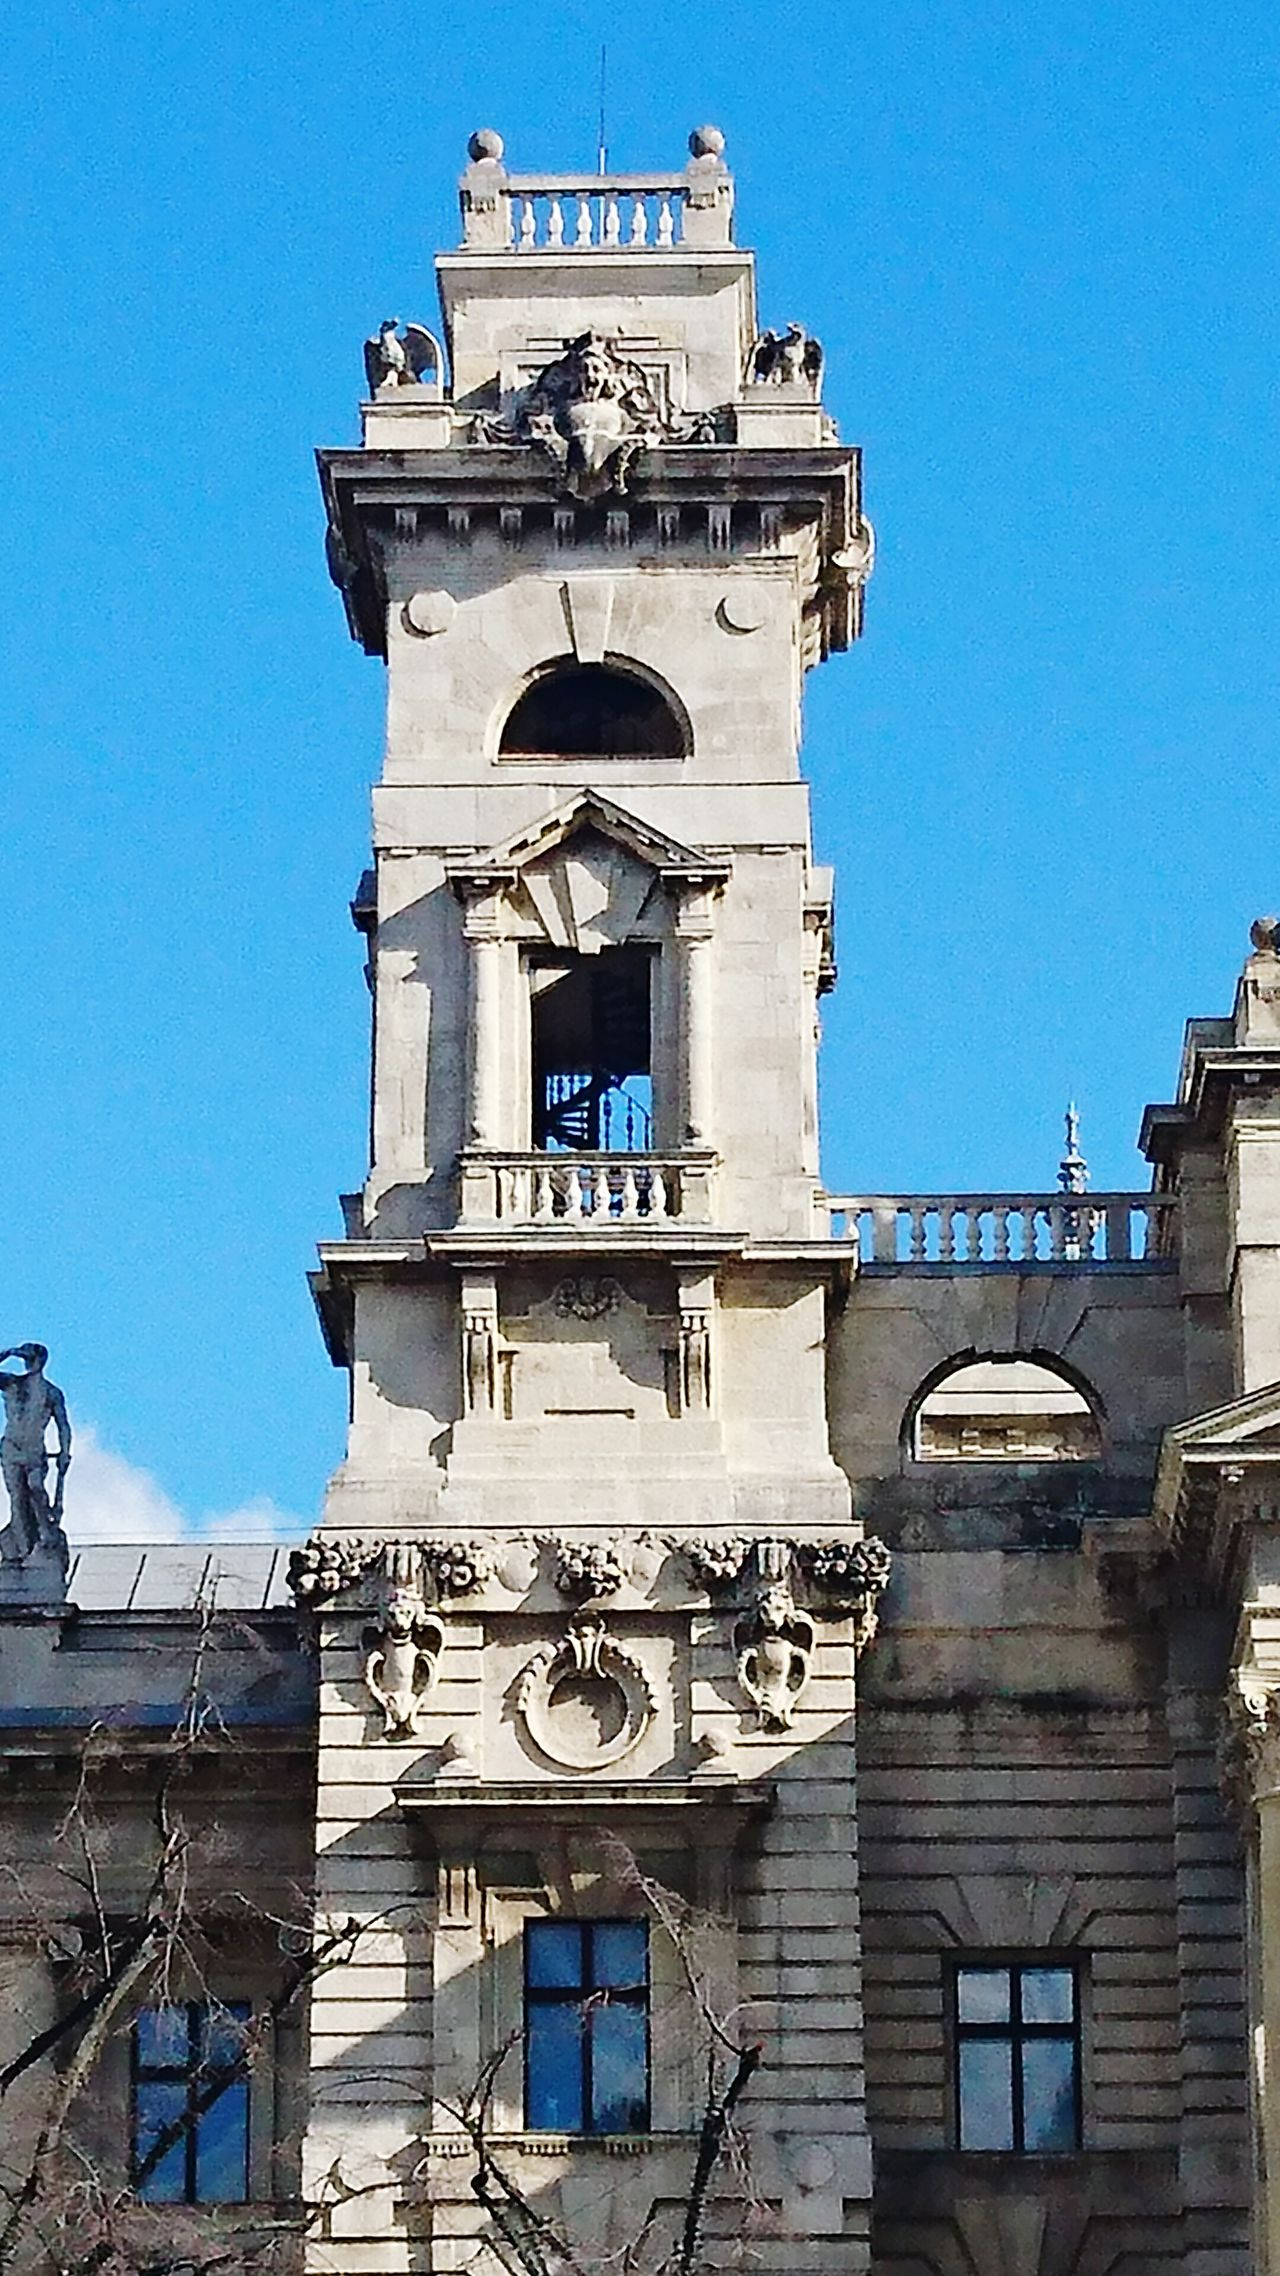 Néprajzi Múzeum Budapest, Hungary Architecture Cultures City Sky Day No People Building Exterior